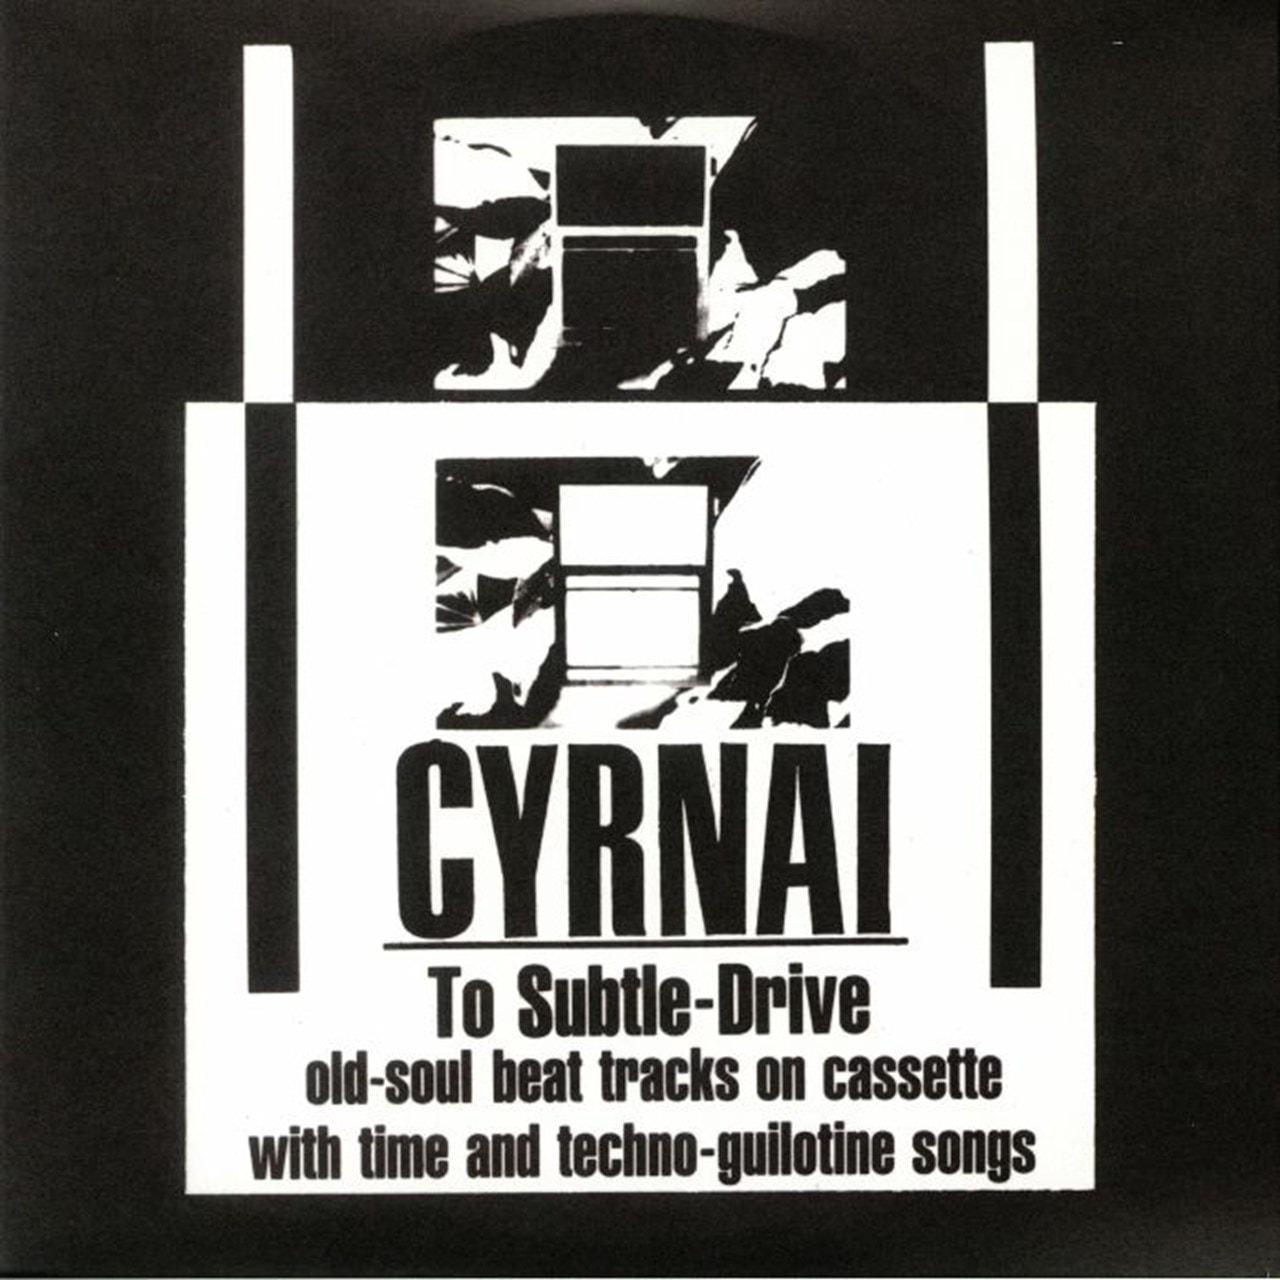 To Subtle-drive - 1